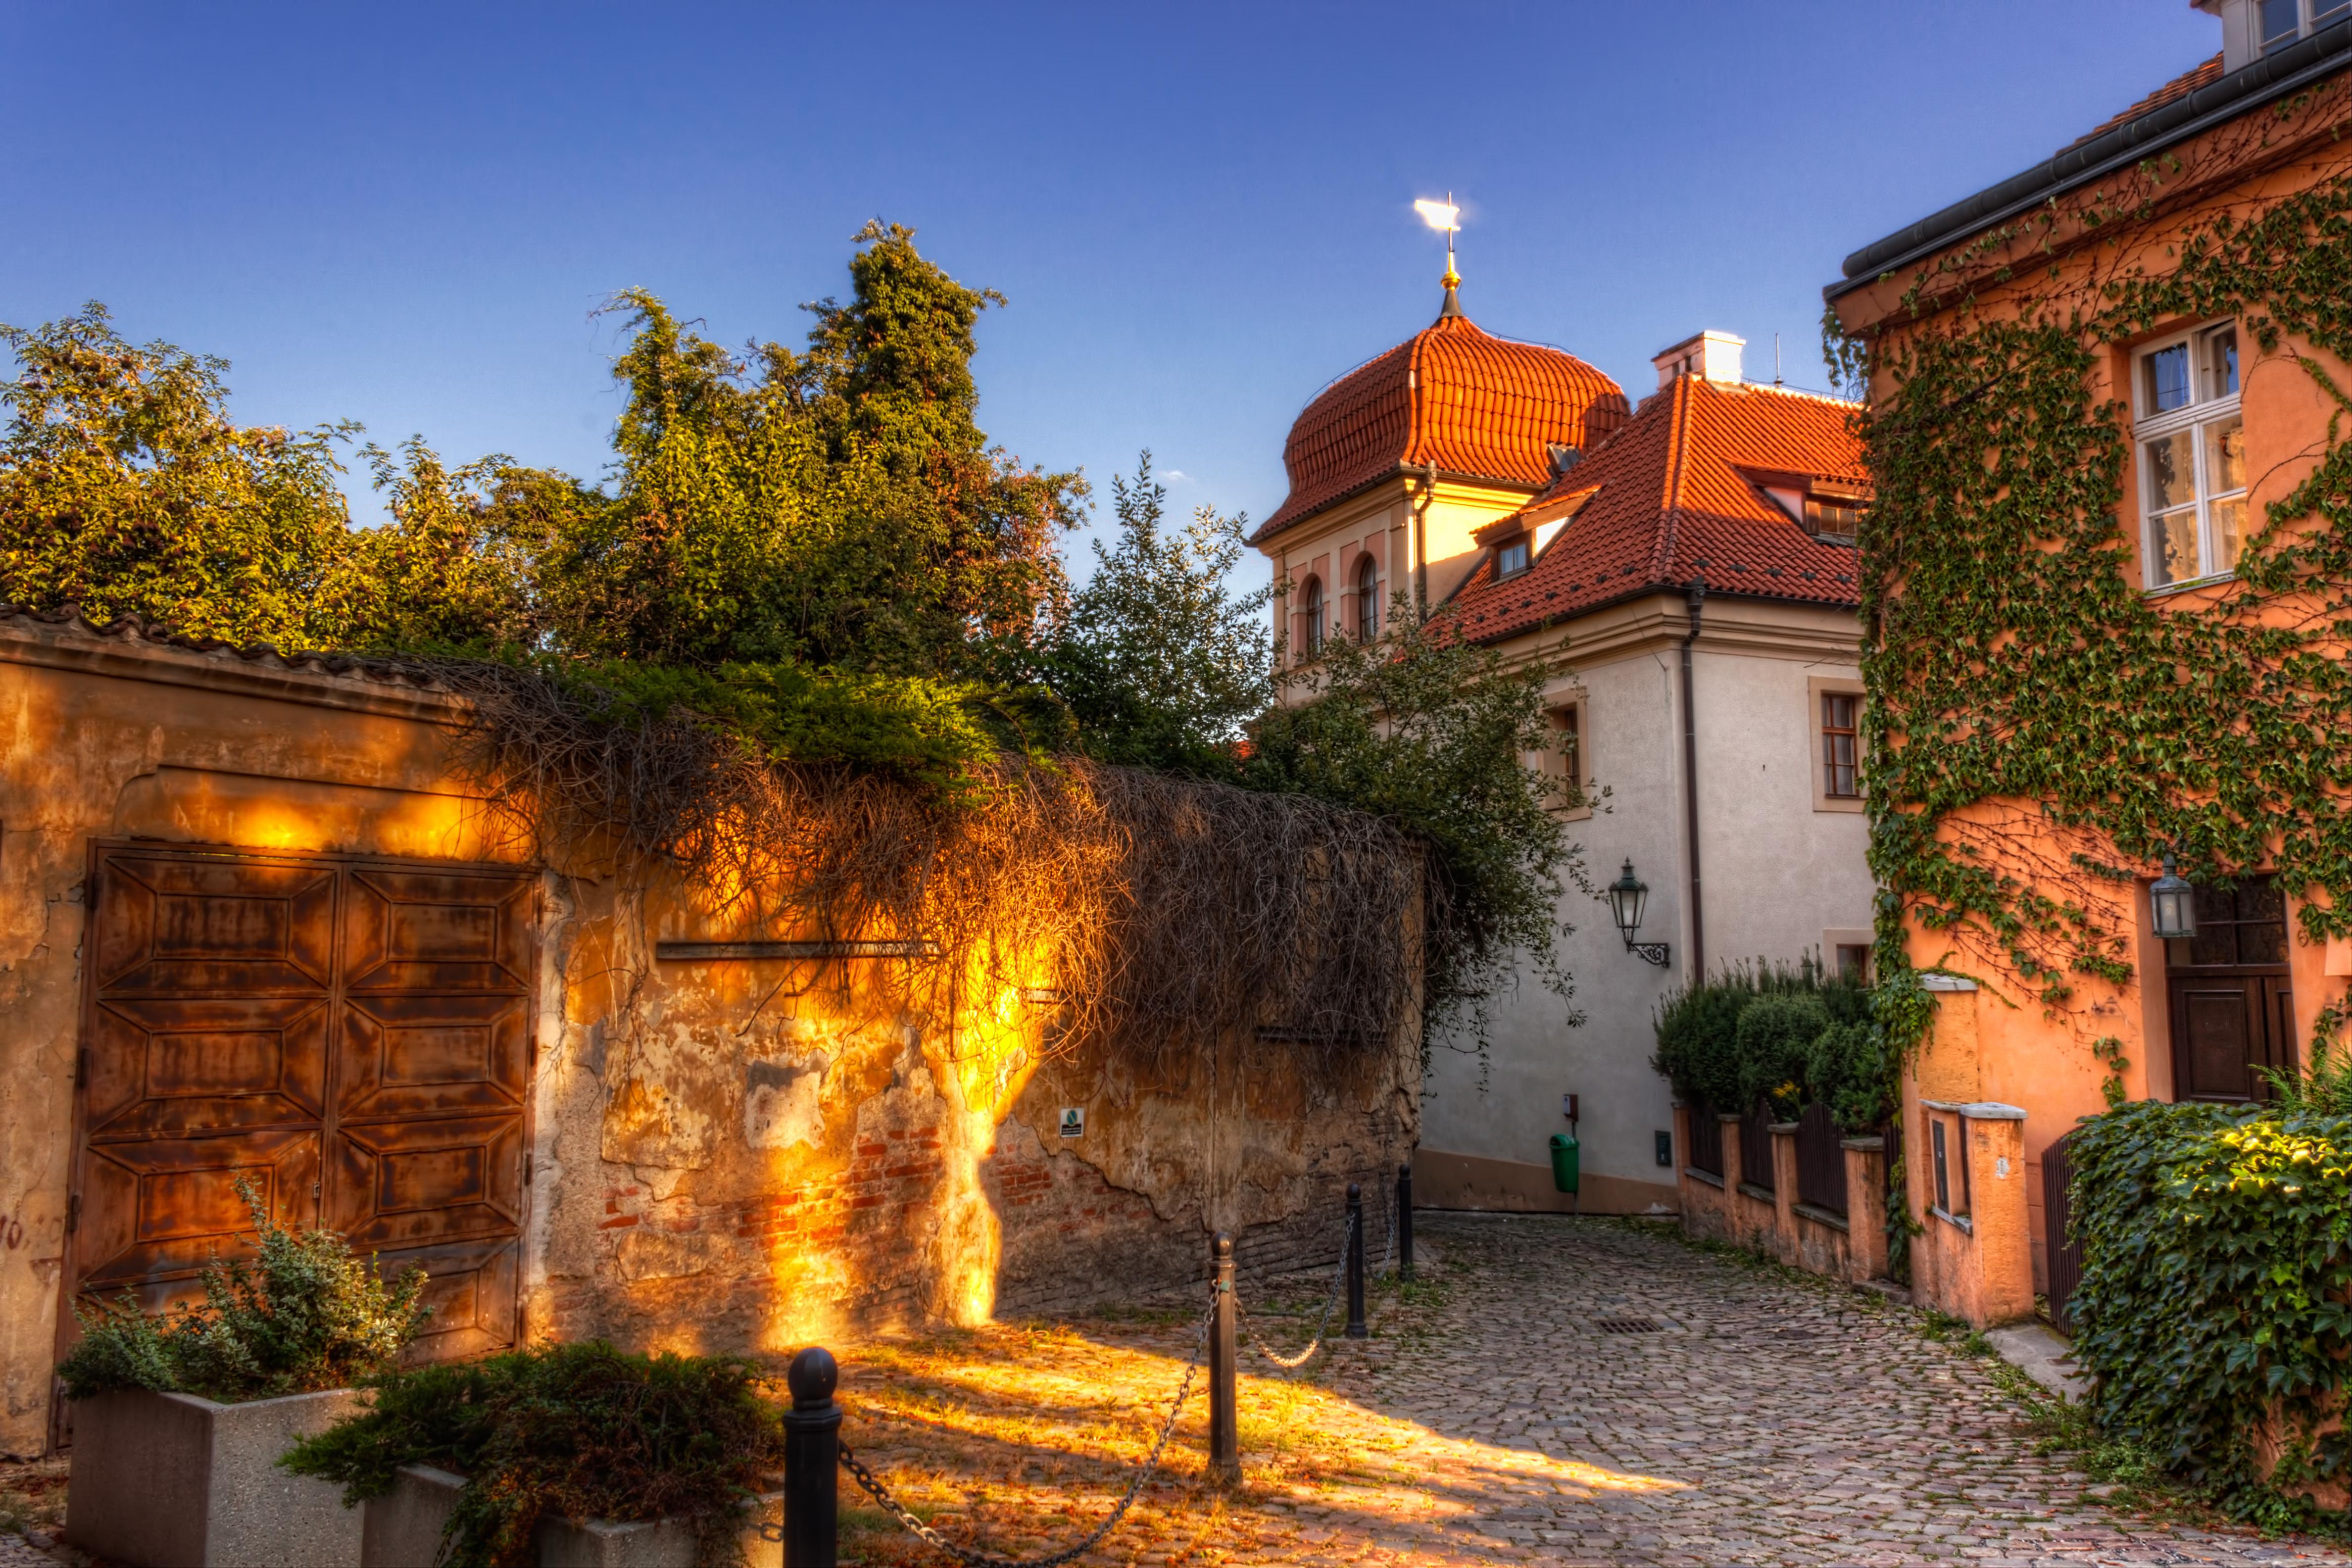 Golden Alley in Praag